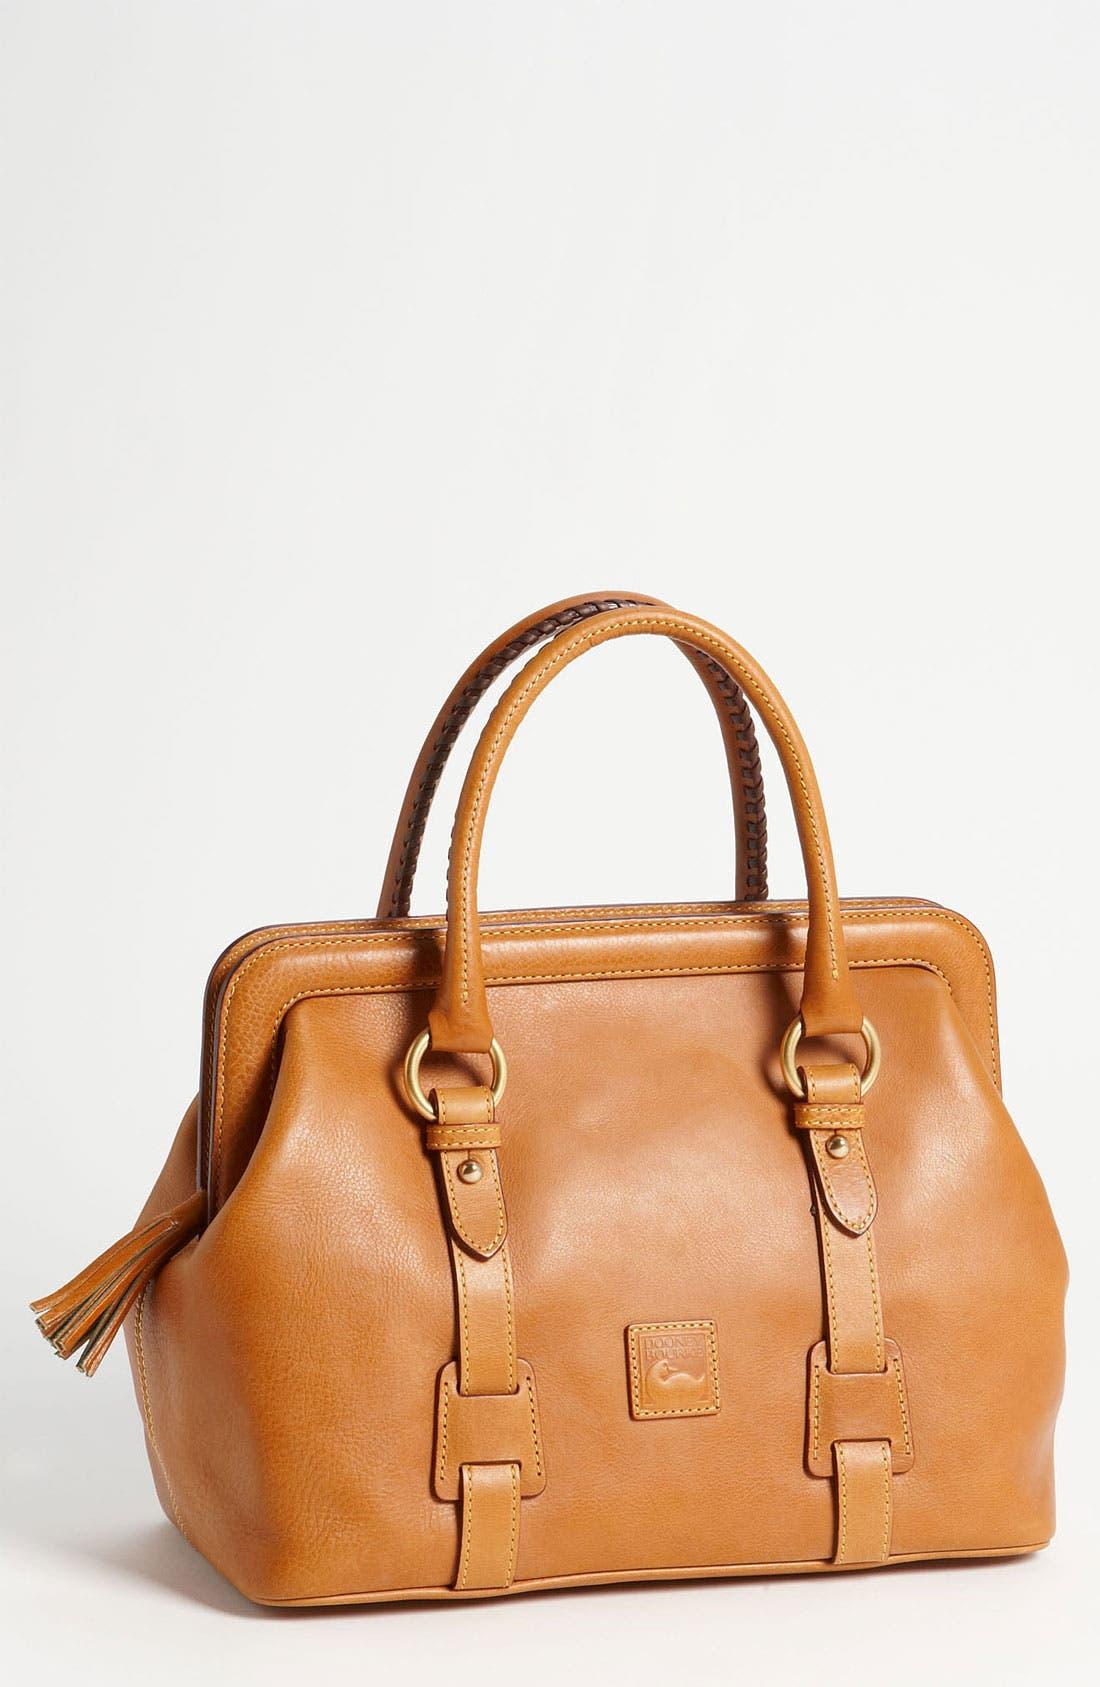 Main Image - Dooney & Bourke 'Mitchell' Handbag